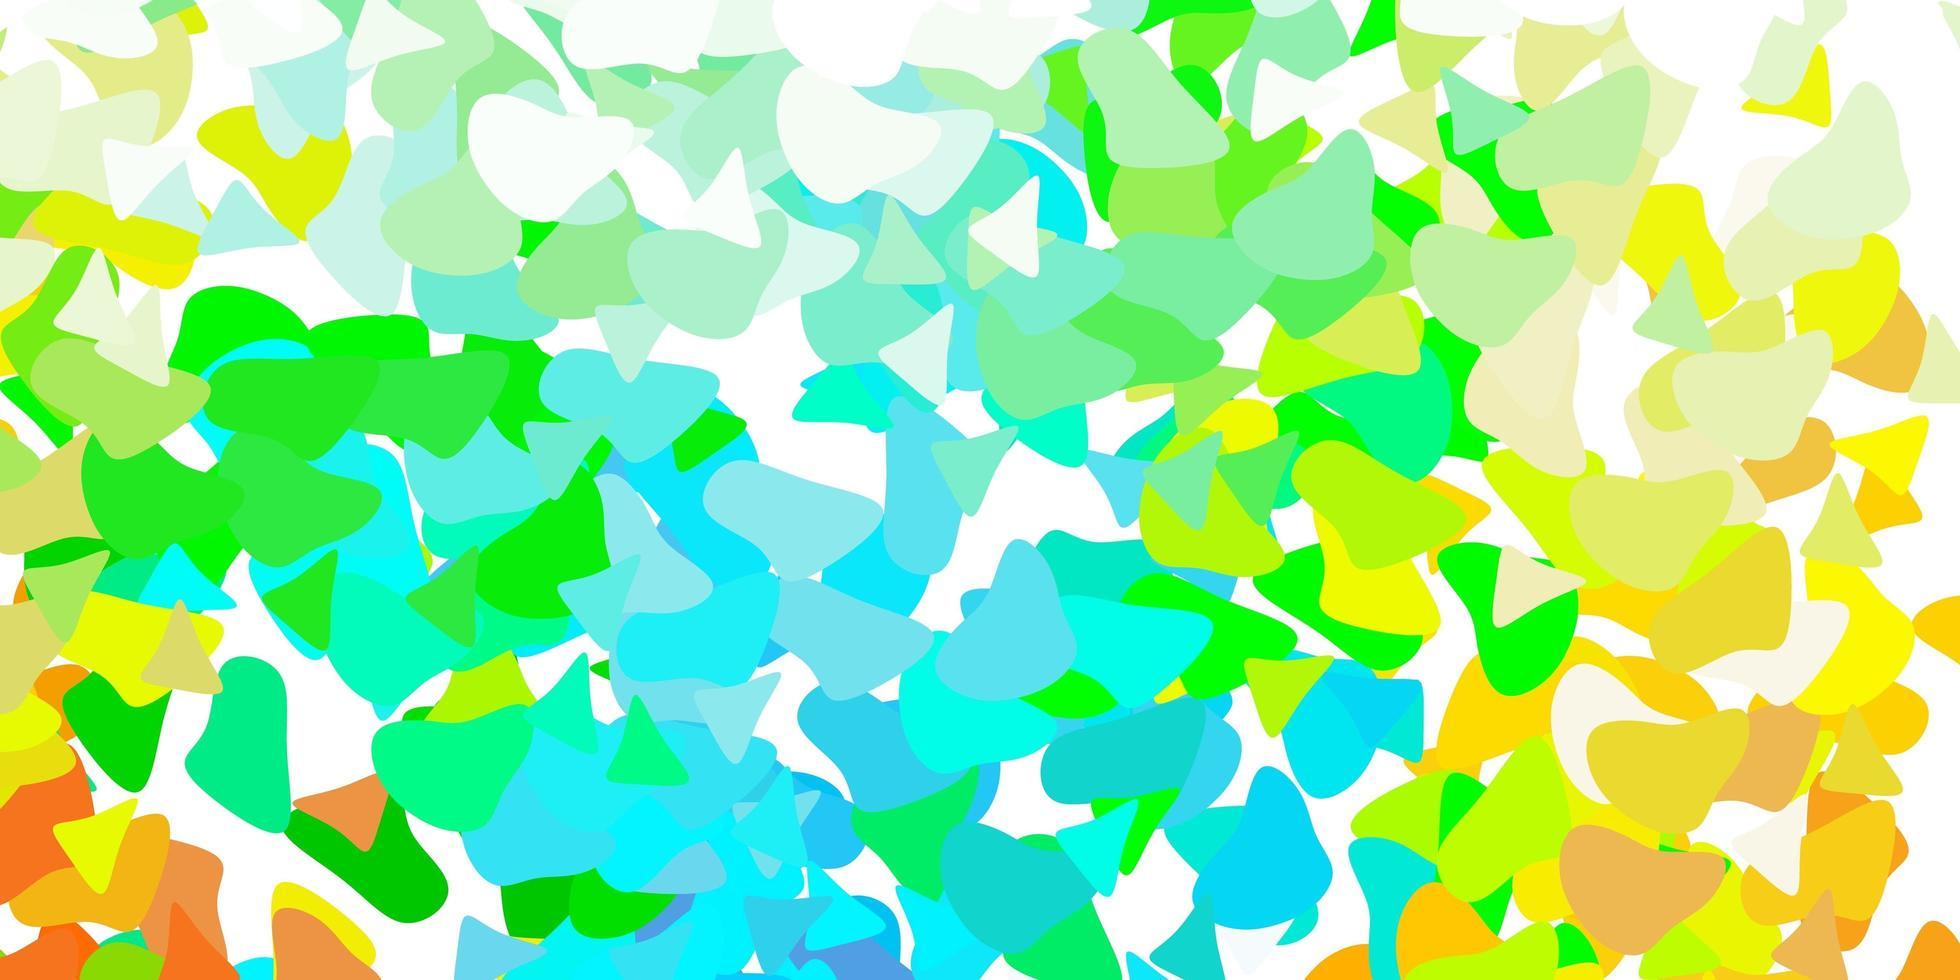 lichtblauwe, gele vectorachtergrond met chaotische vormen. vector